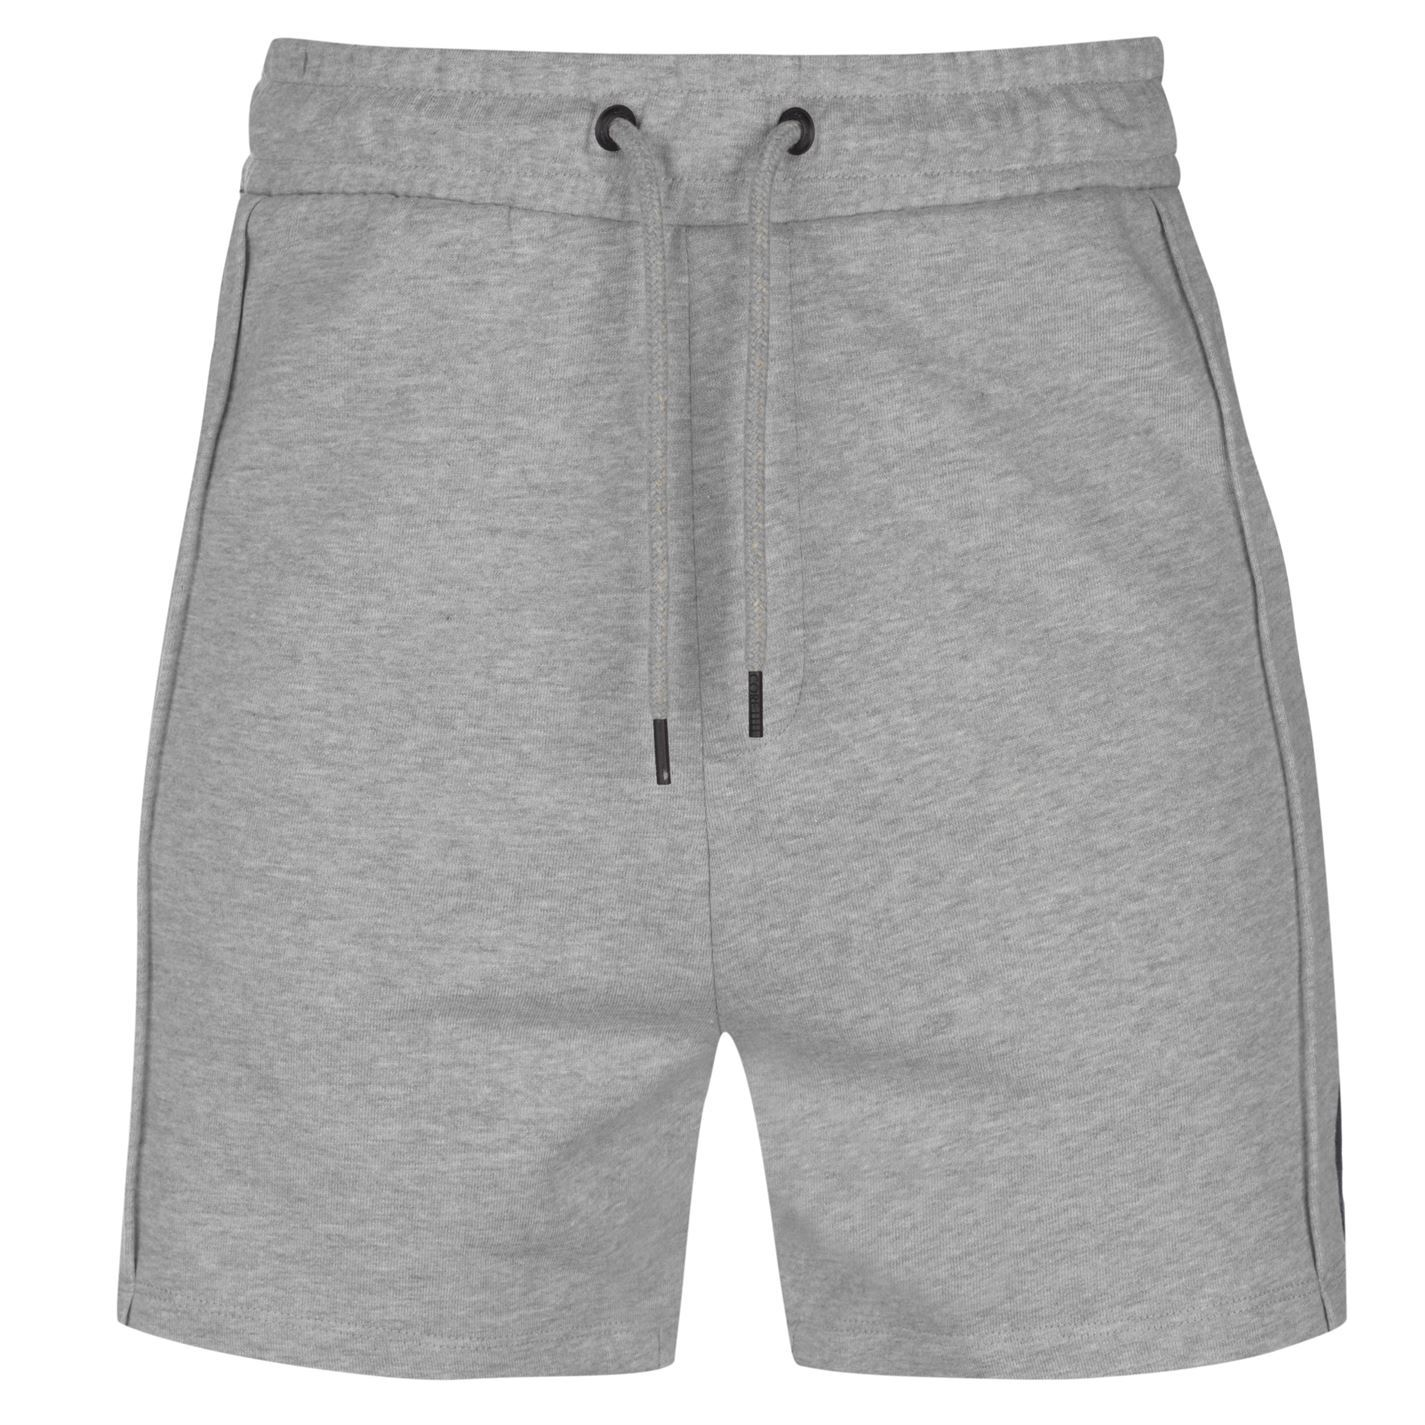 Jack-amp-Jones-Core-Dexter-Shorts-Mens-Bottoms-Short-Pants-Summerwear thumbnail 6